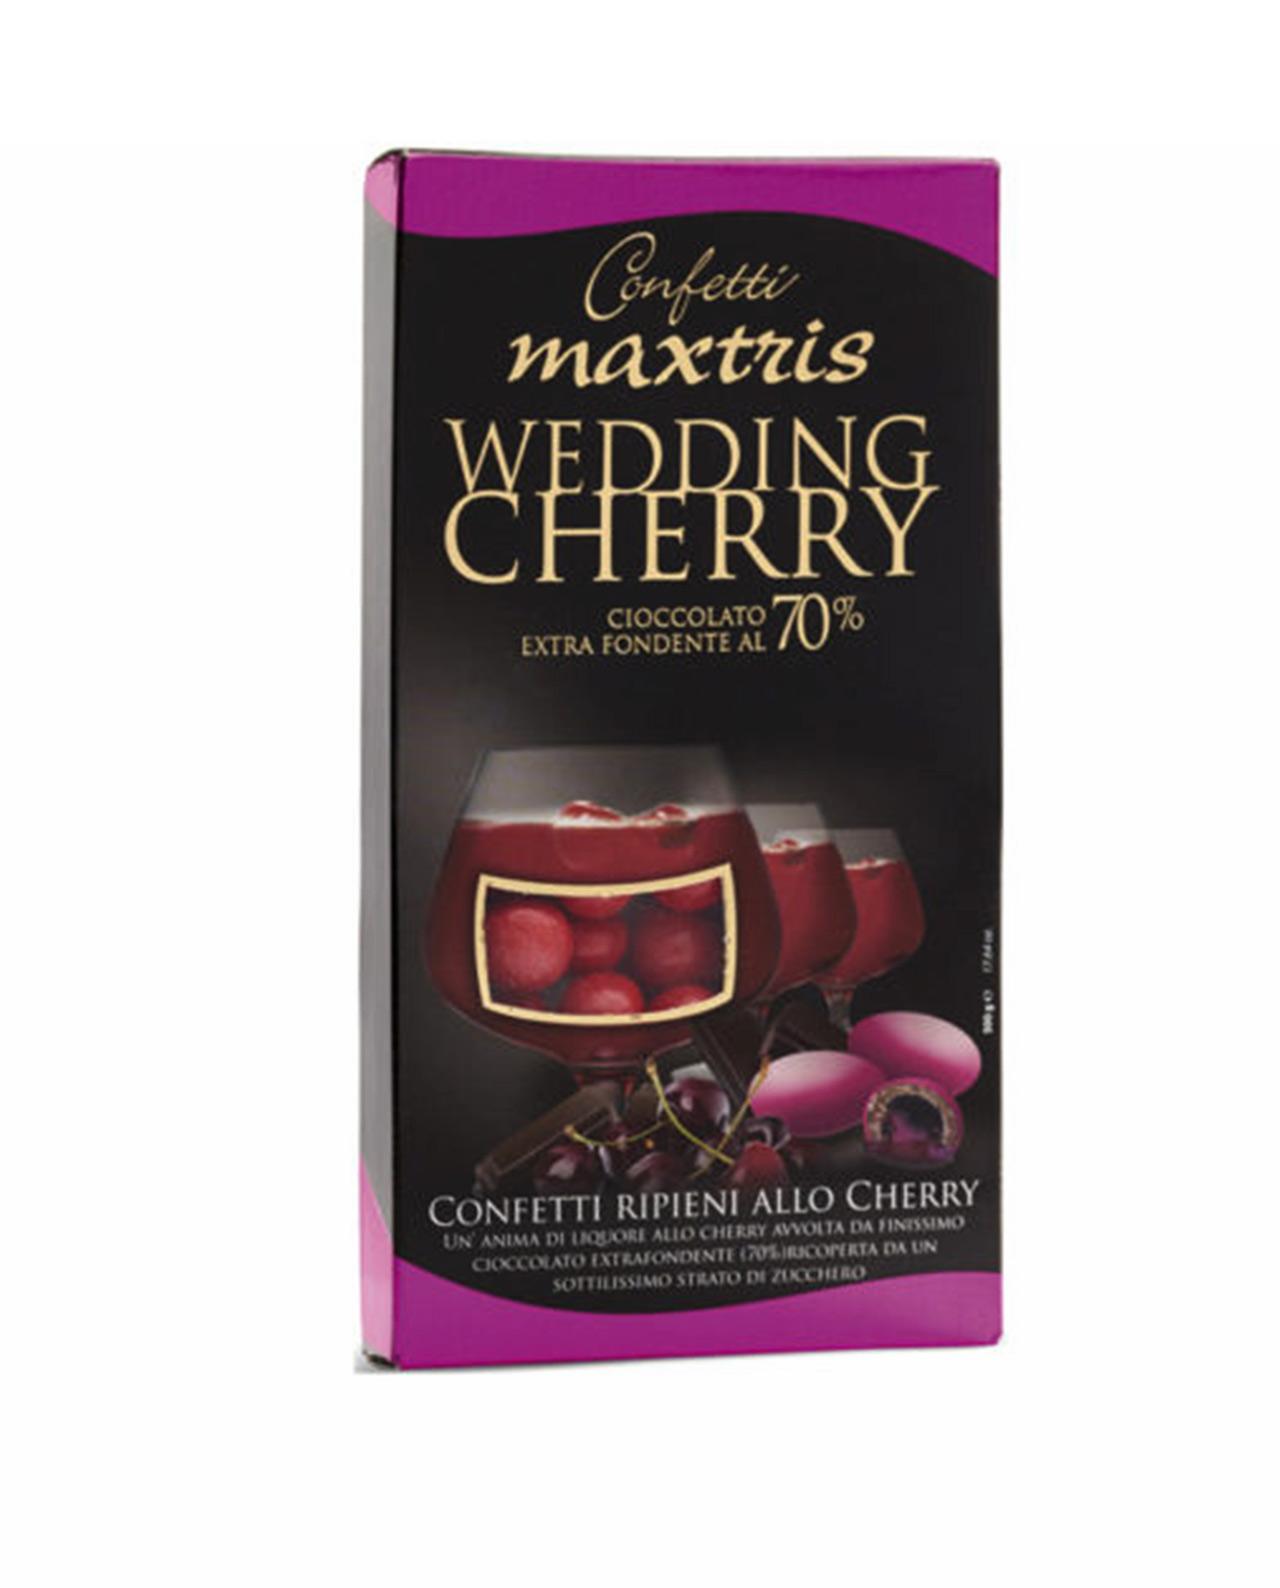 Confetti maxtris wedding cherry mobilia store home favours for Mobilia wedding